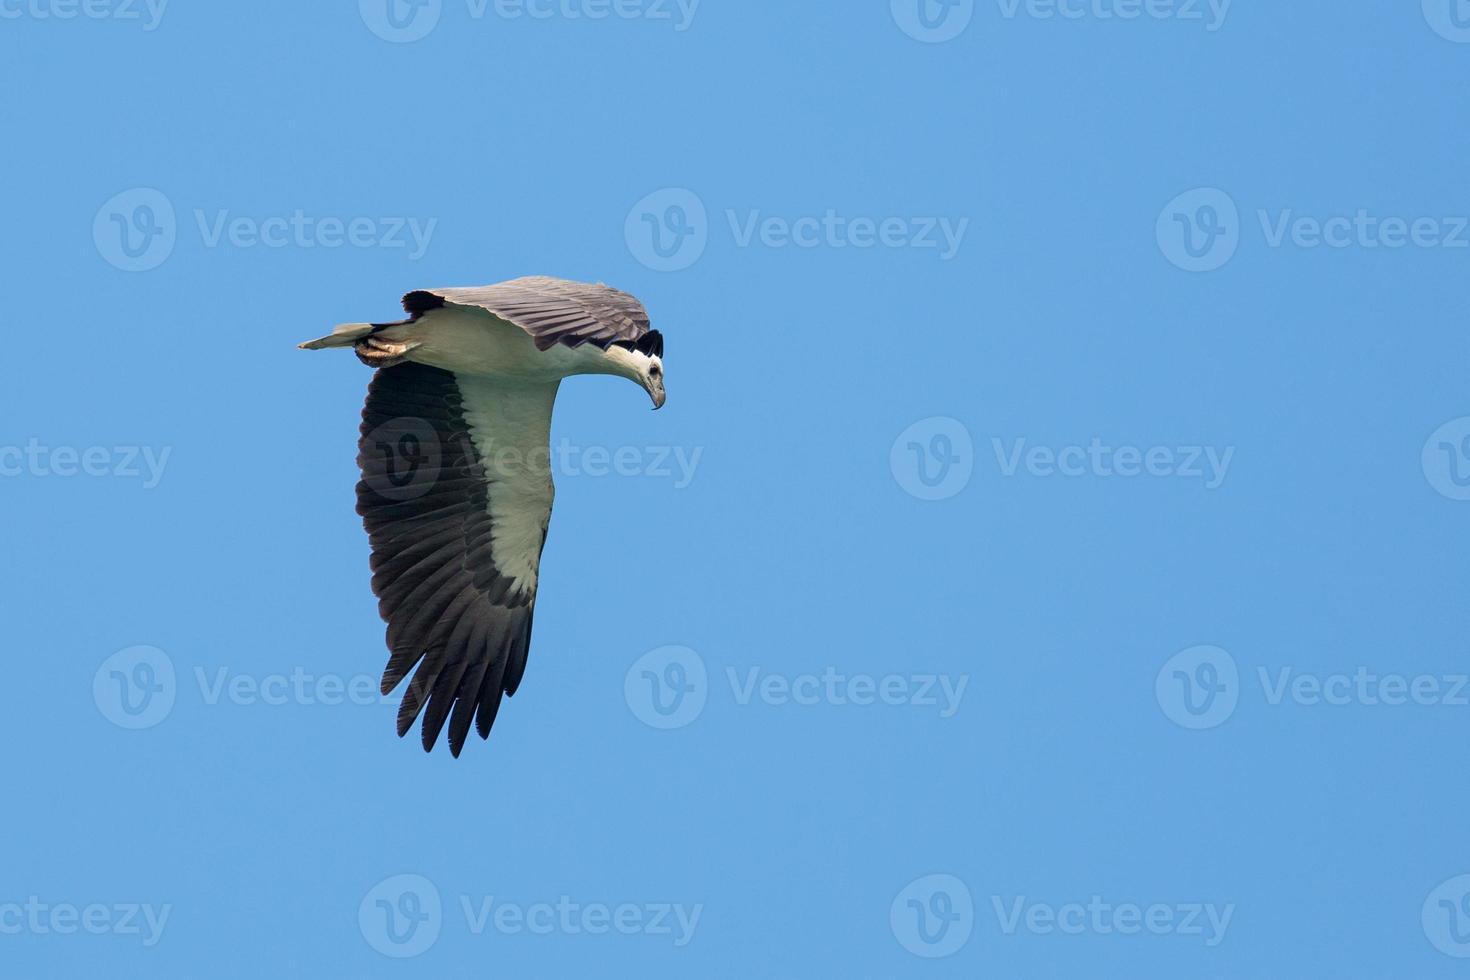 águia de barriga branca voando no céu azul foto